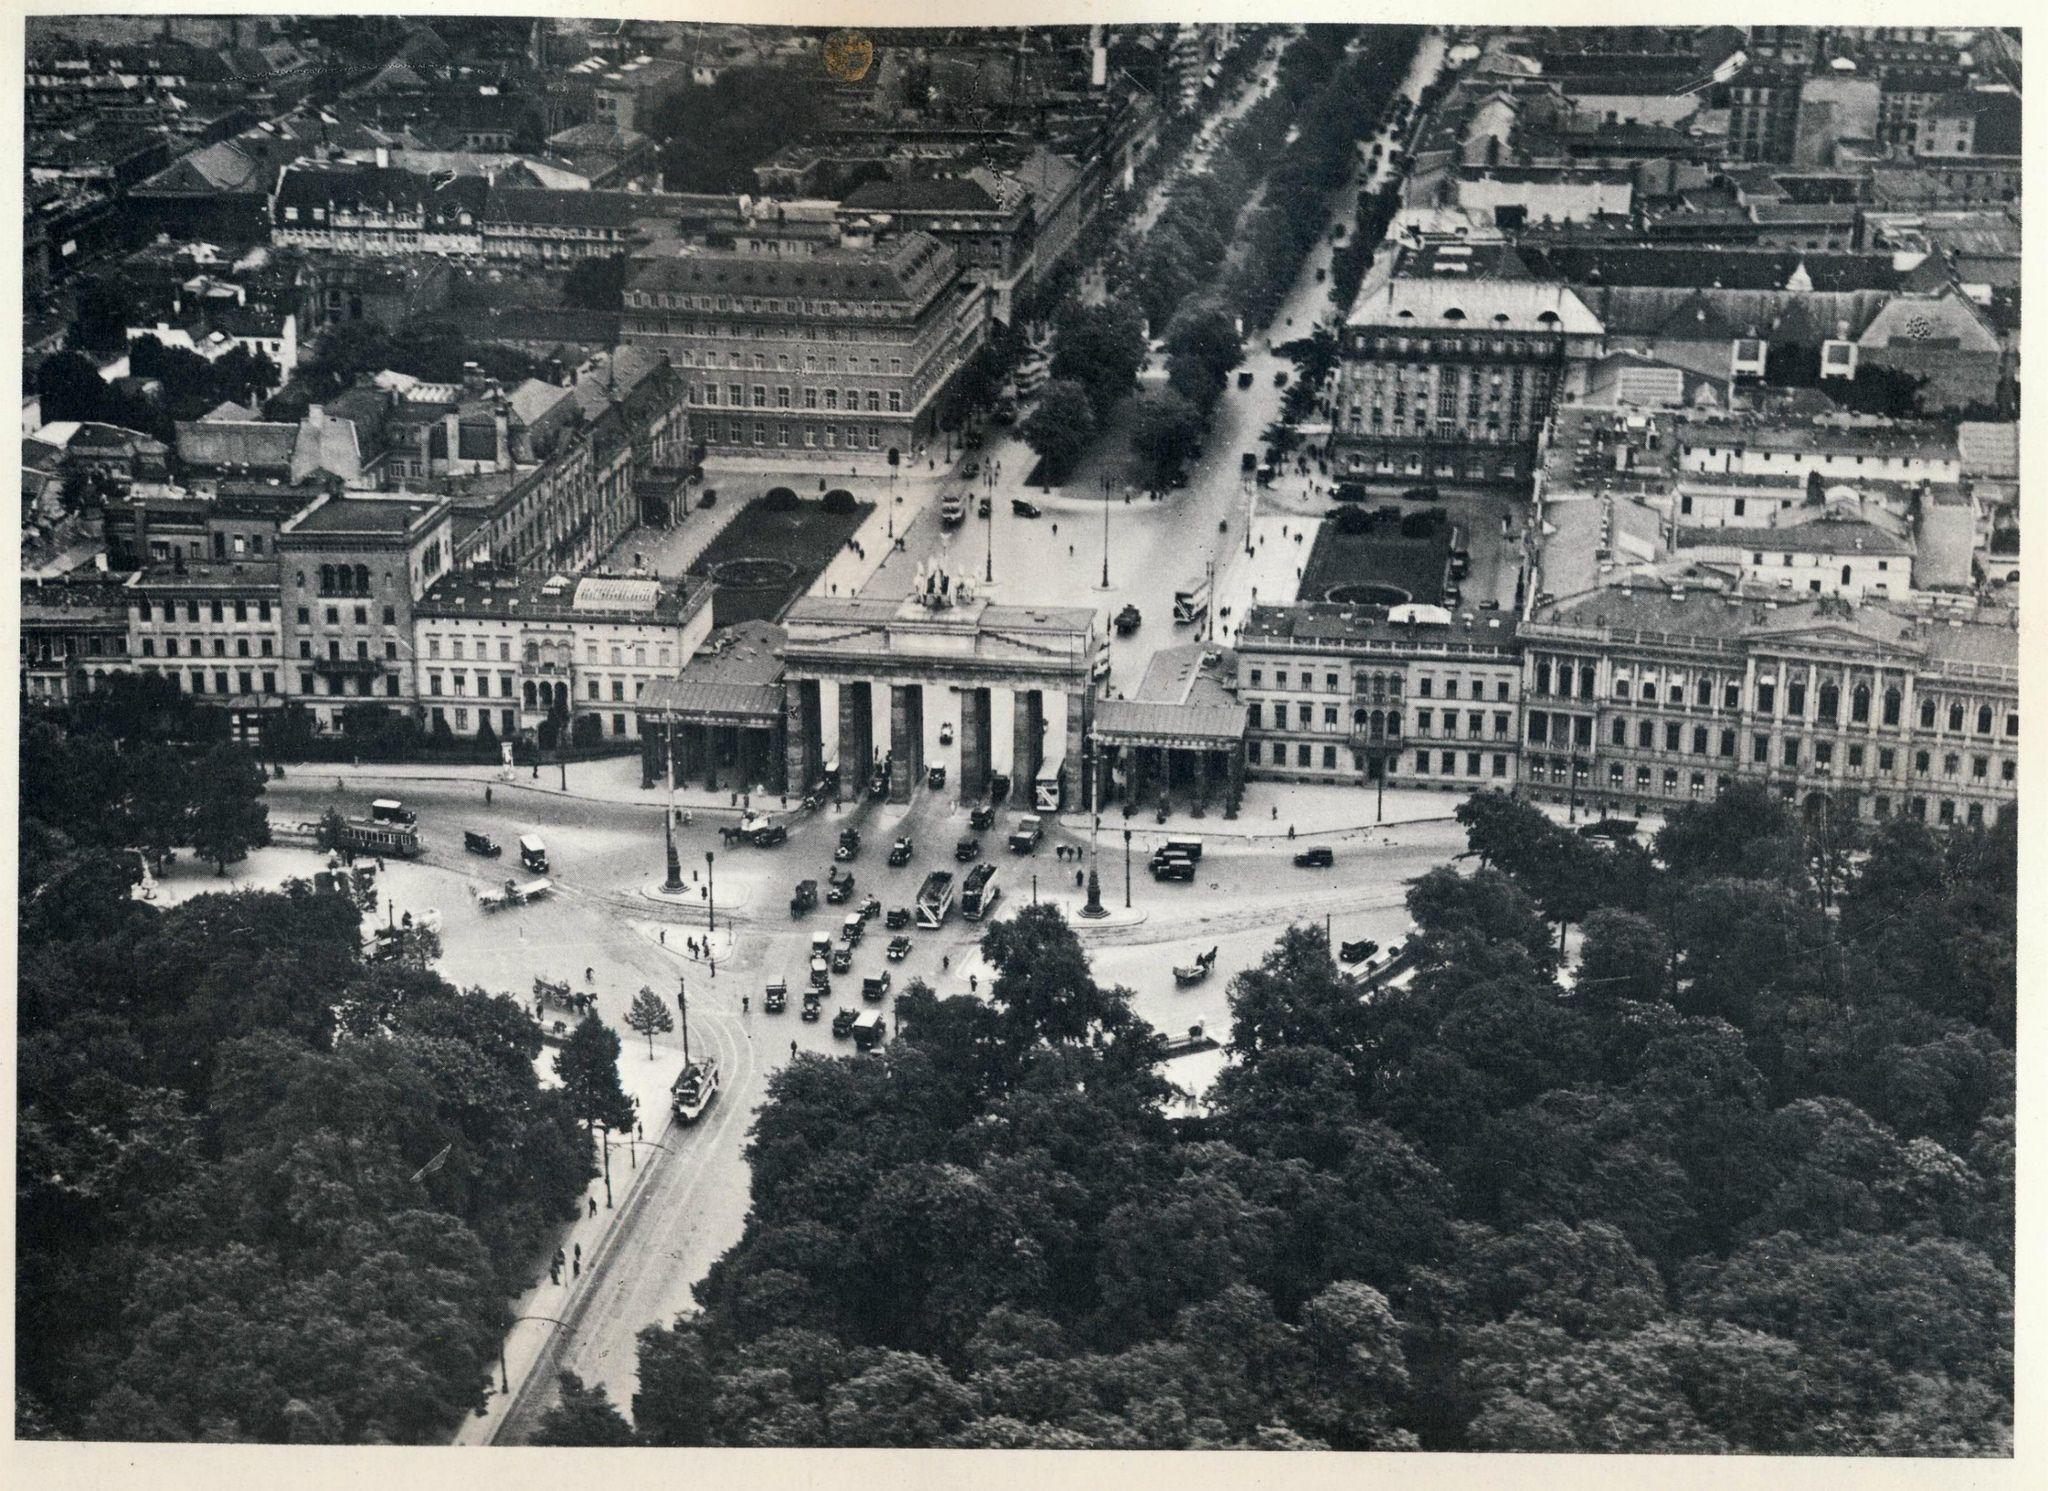 Historische Luftaufnahmen Berlin 1983 Brandenburger Tor 1928 Beautiful Places To Travel Berlin Germany Berlin